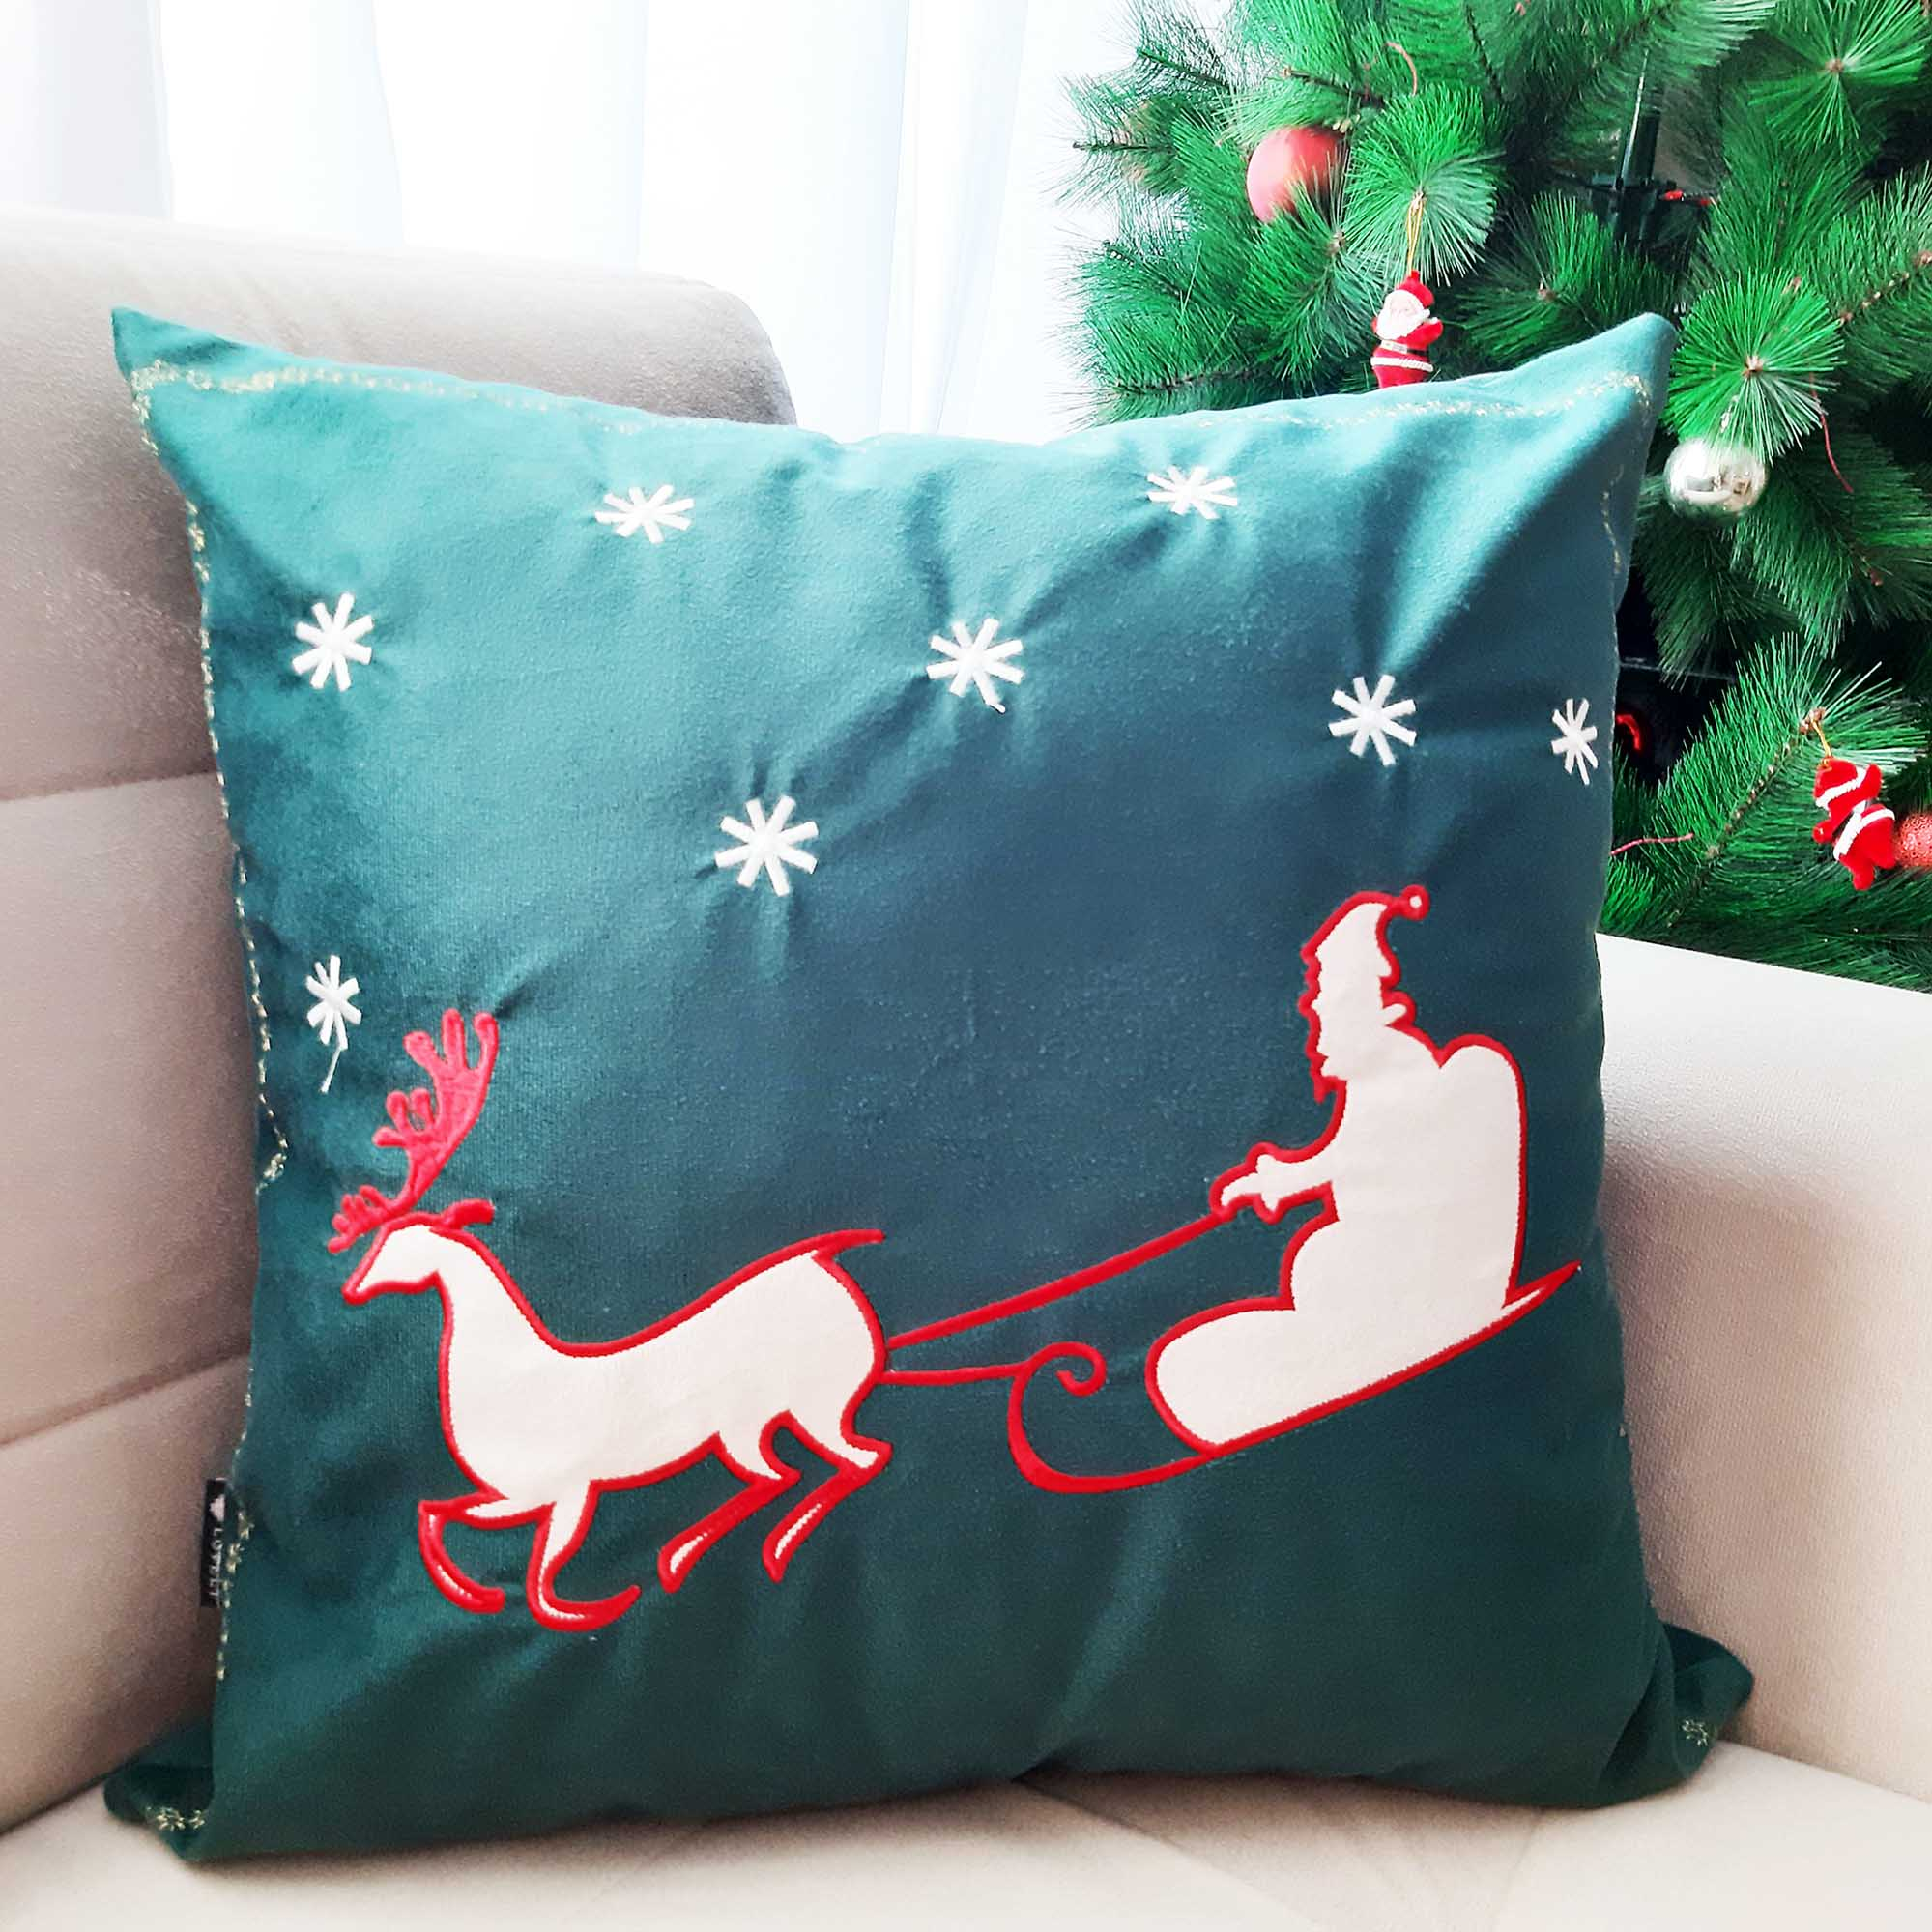 Capa de Almofada Bordada em Suede Verde Trenó Papai Noel